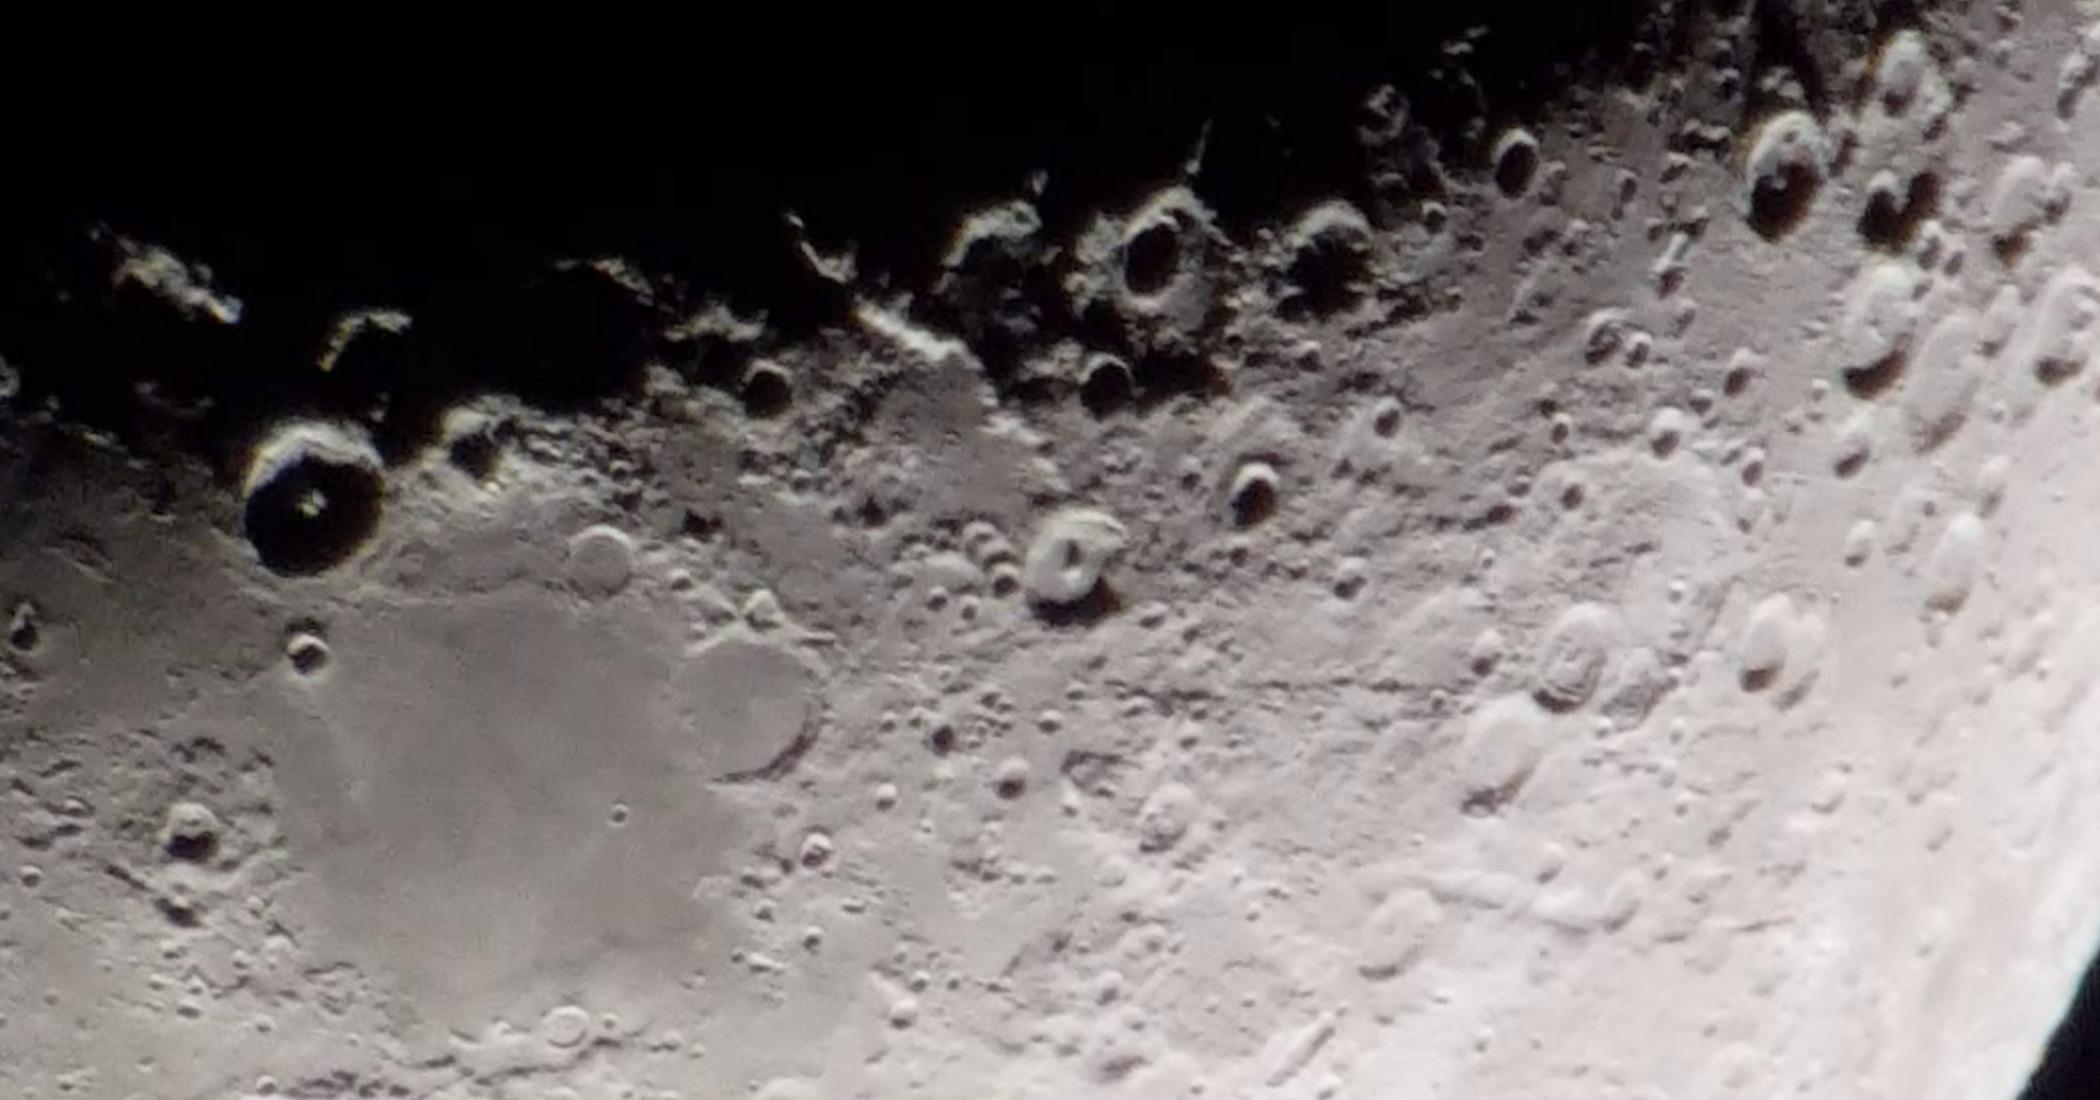 Moon video using smartphone